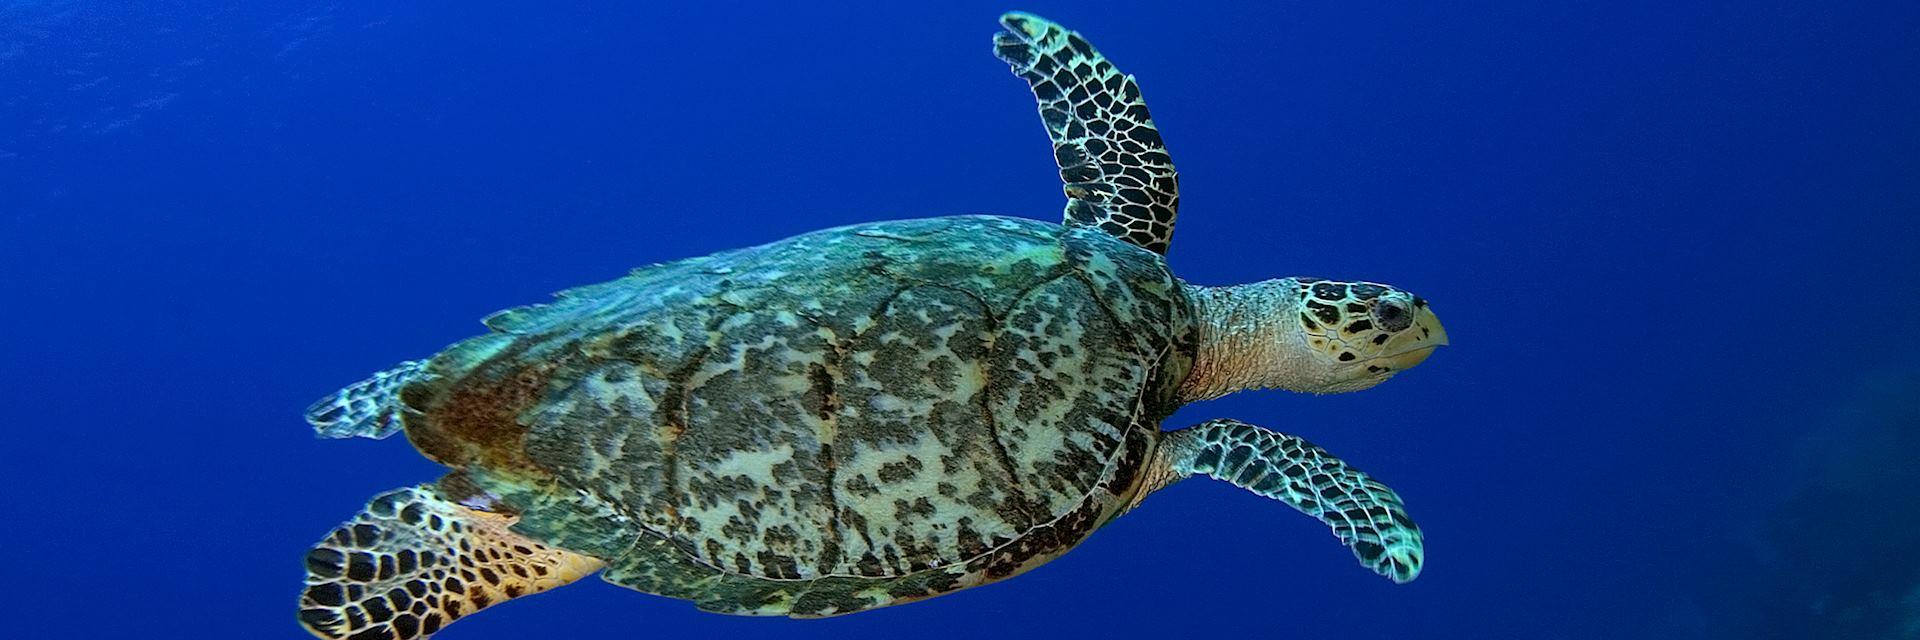 Hawksbill turtle, St. Lucia